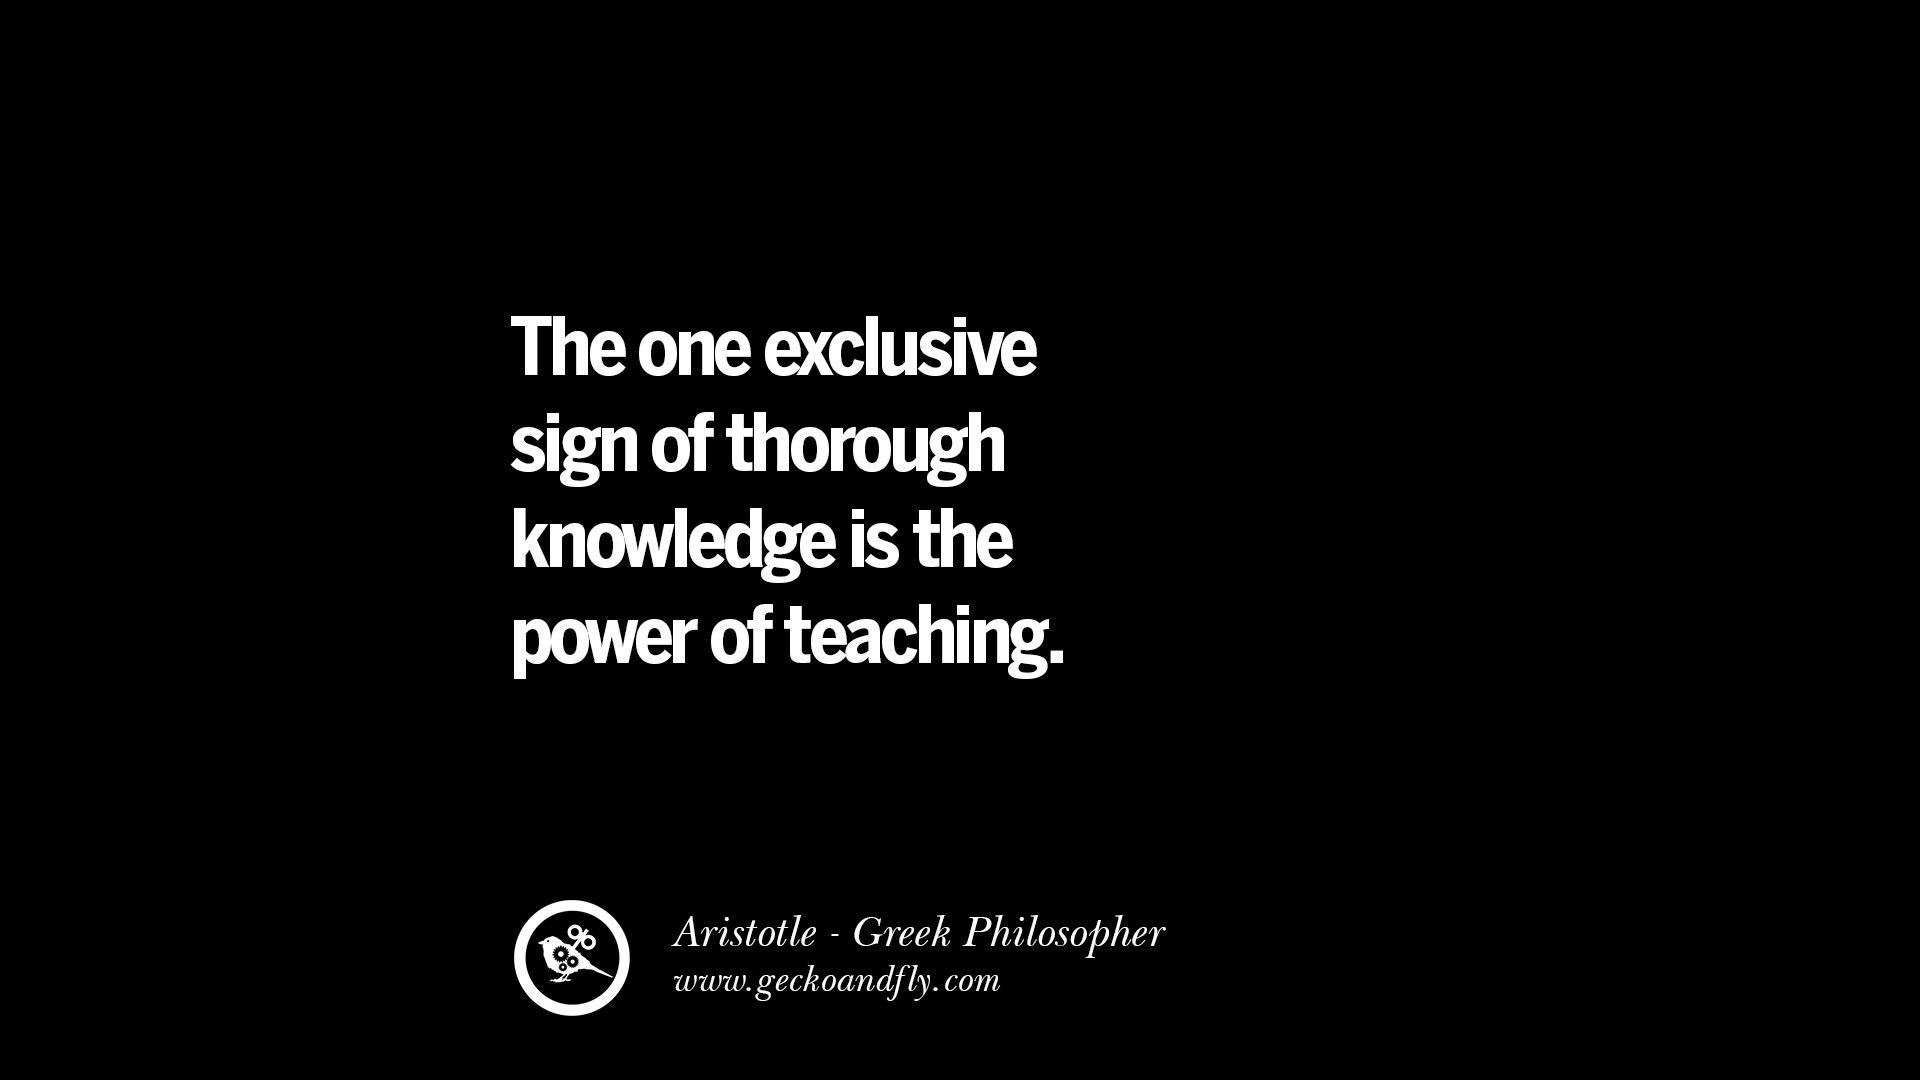 Aristotle Quotes: 40 Famous Aristotle Quotes On Ethics, Love, Life, Politics